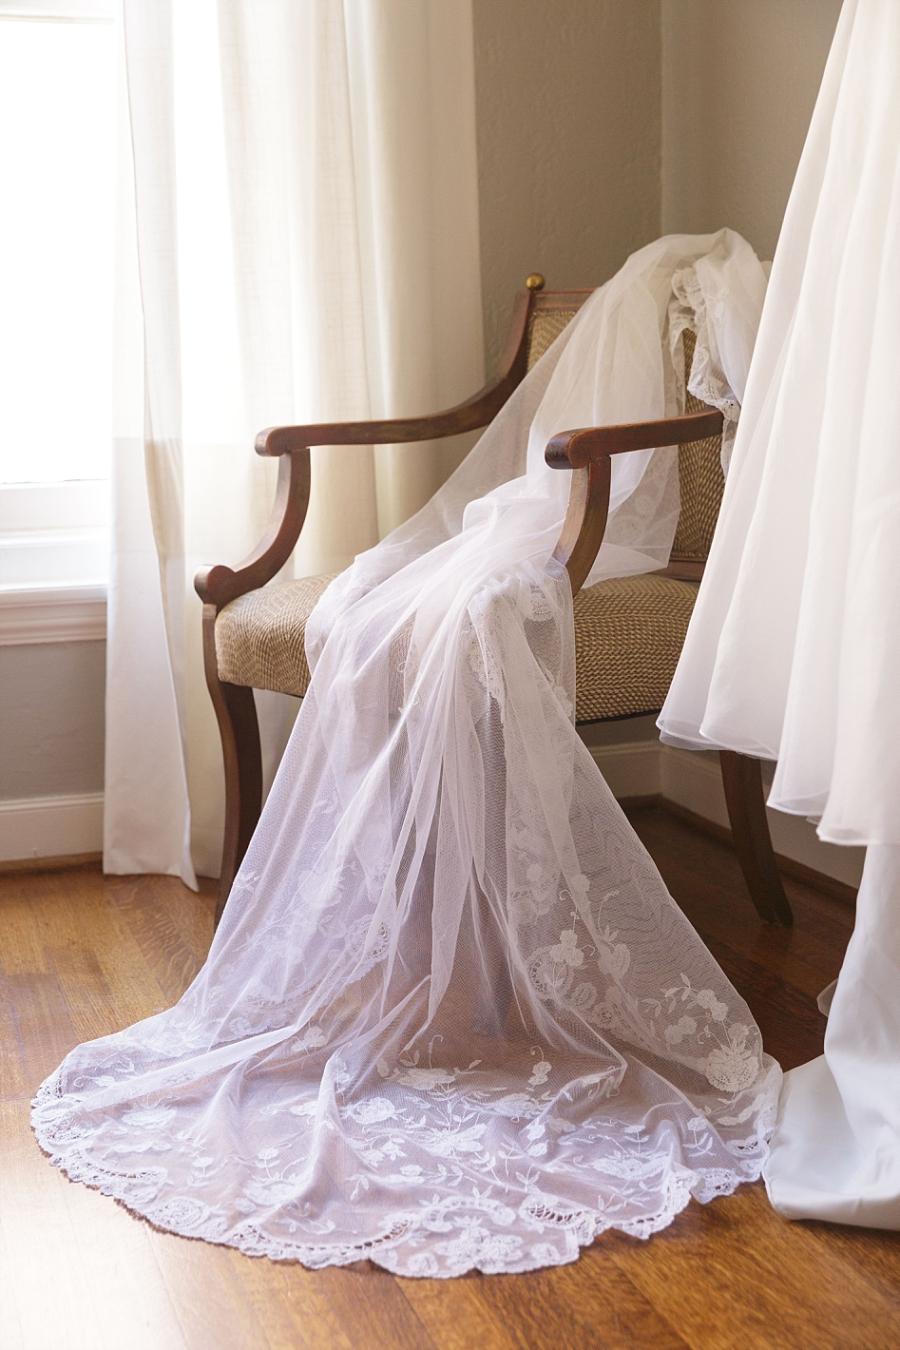 Stacy-Anderson-Photography-McGovern-Centennial-Gardens-Houston-Wedding-Photographer_0002.jpg